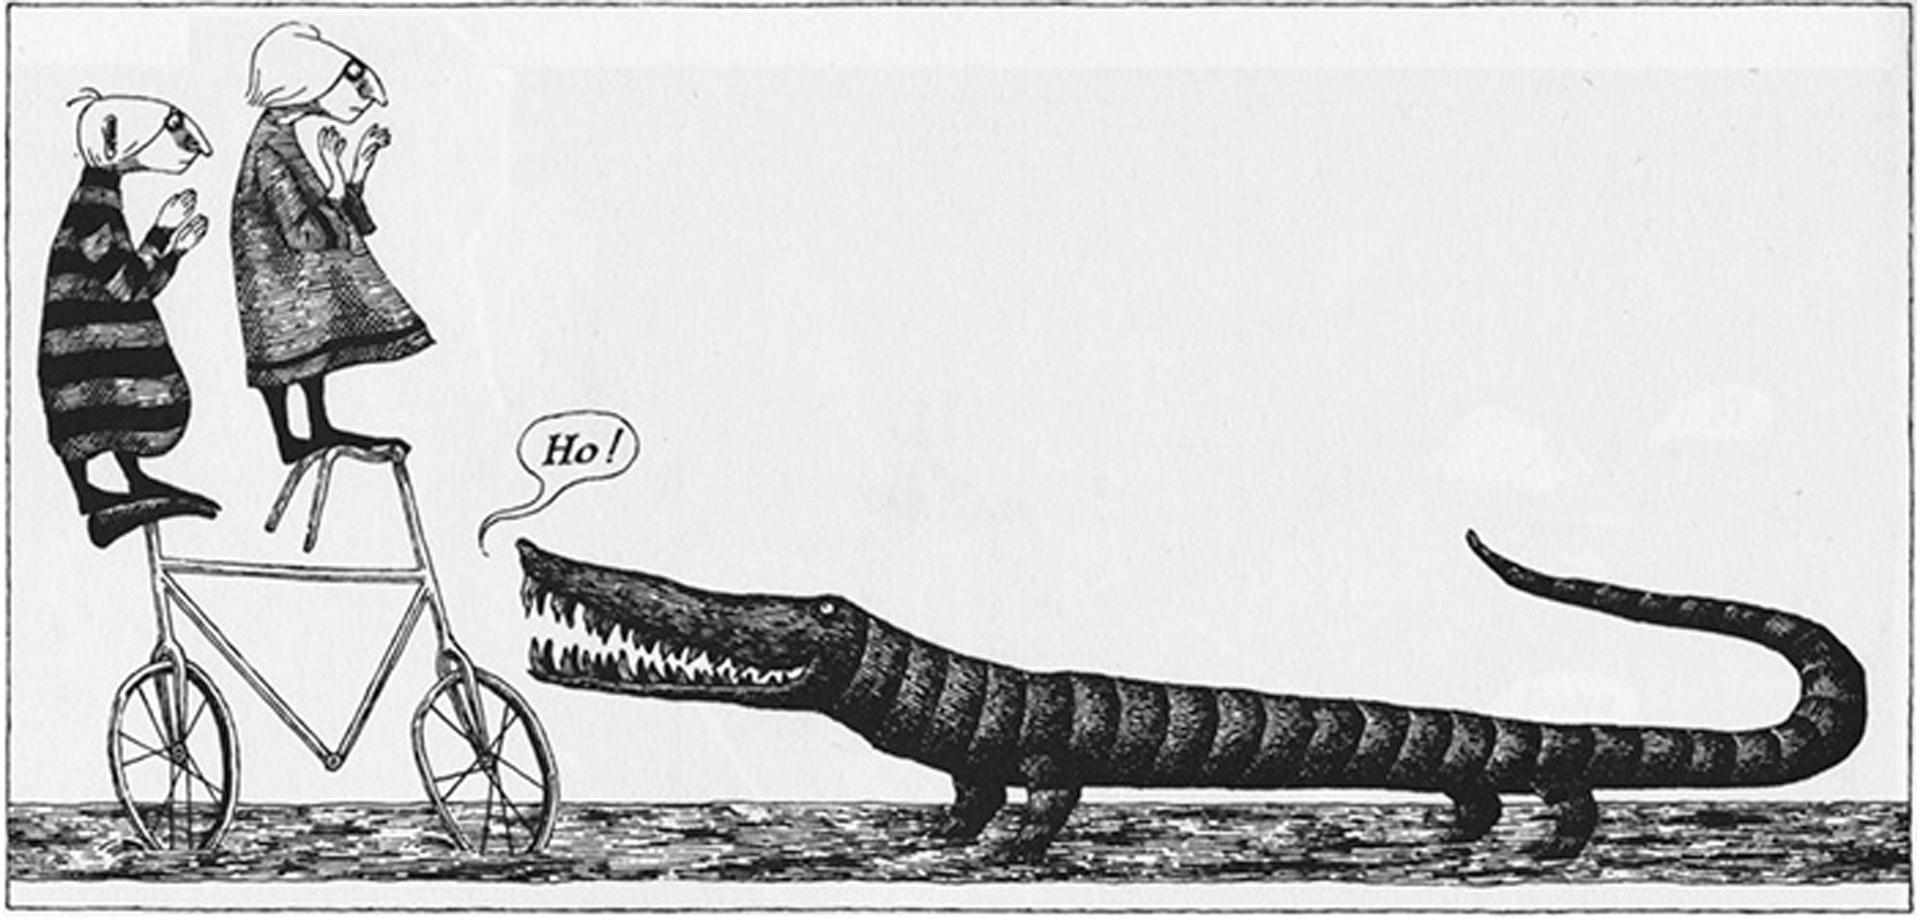 Edward-Gorey-ilustracion.jpg